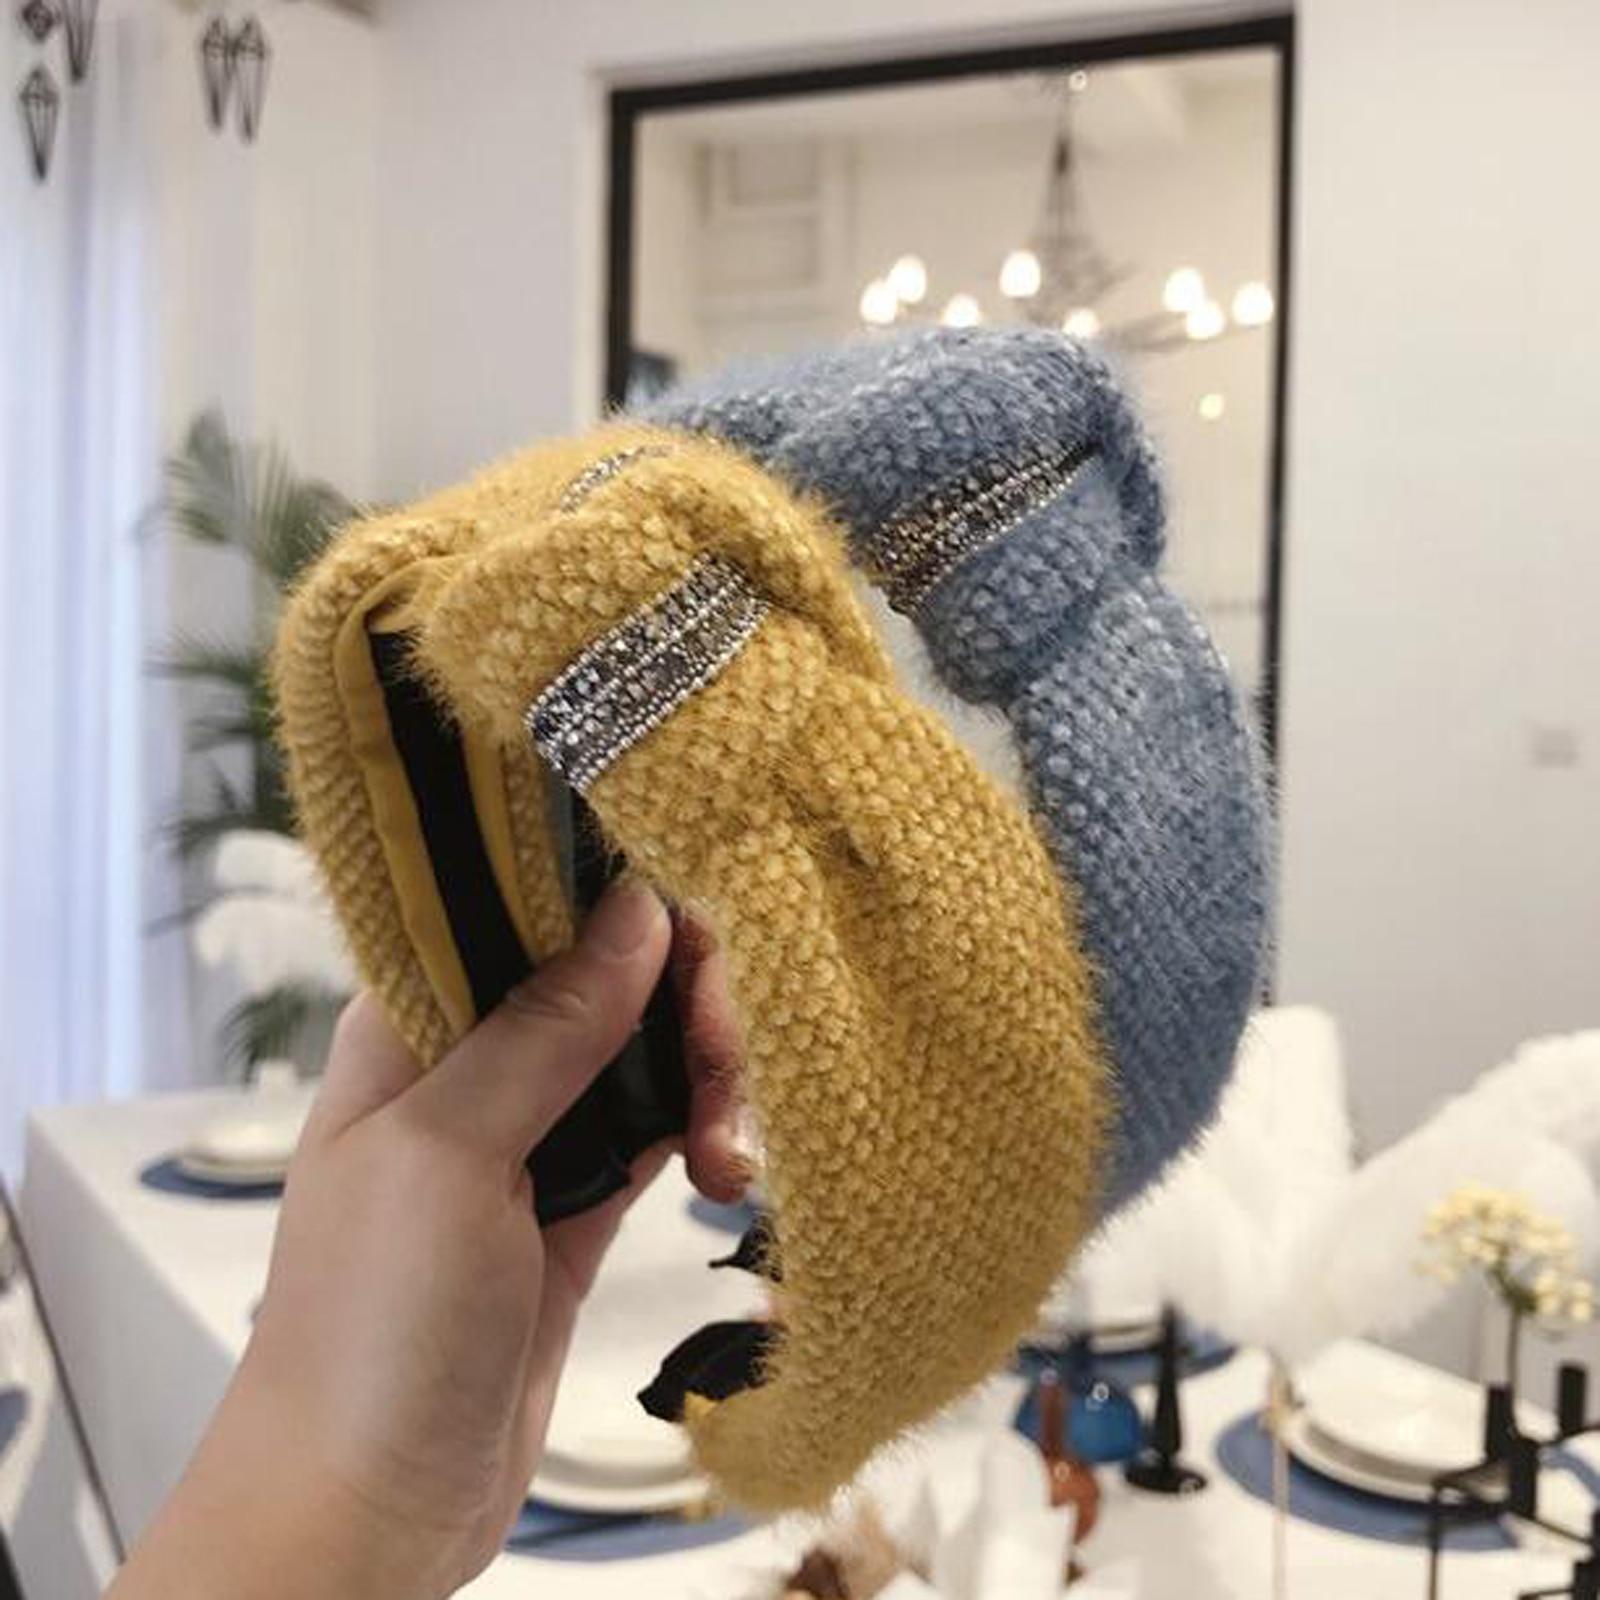 New Fashion Women Headband Winter Wide Side Knittd Hairband Shining Rhinestone Hair Band Adut Turban Hair Accessories